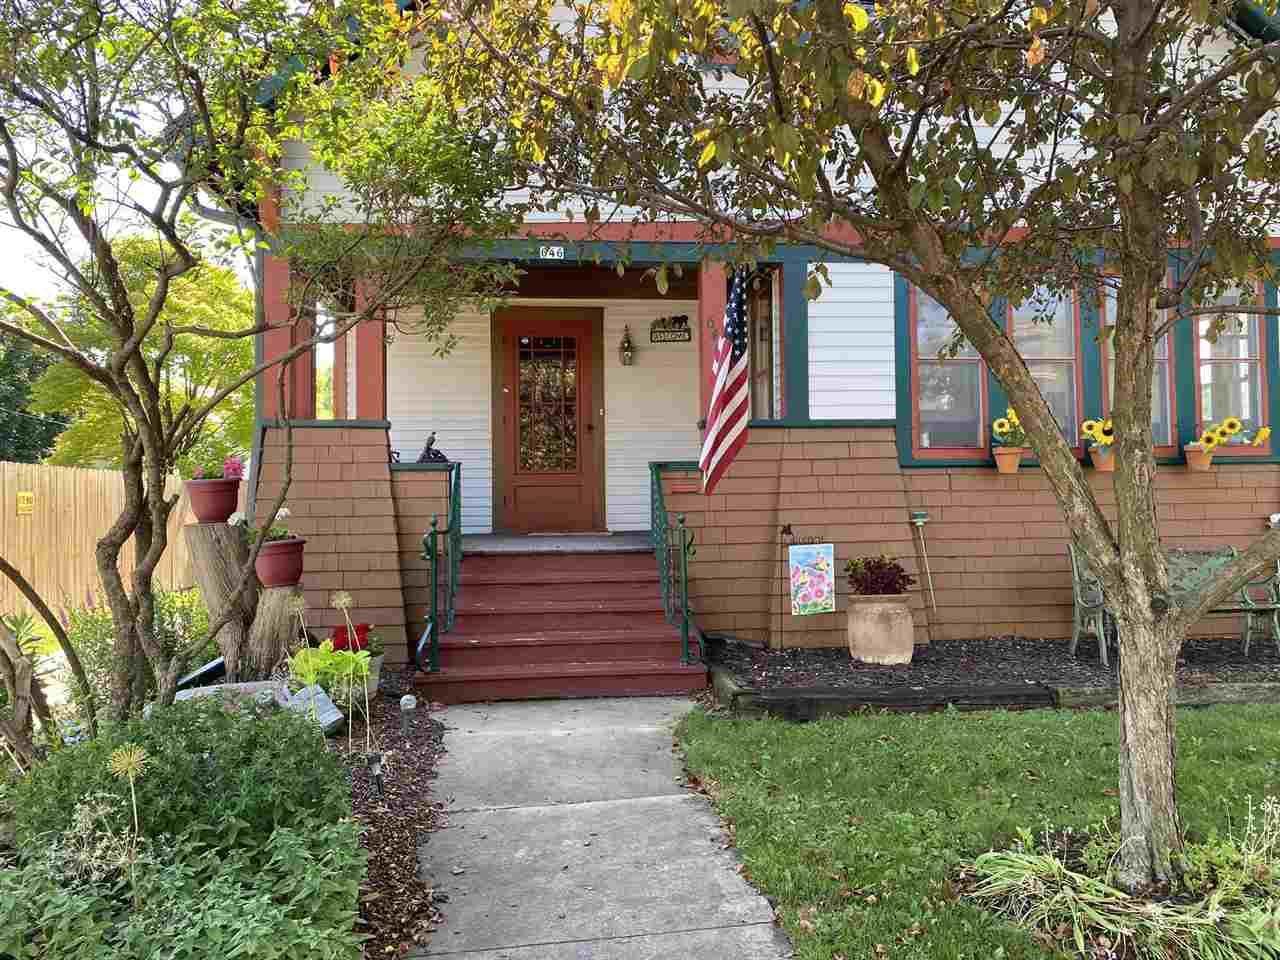 646 BOWEN STREET, Oshkosh, WI 54901 - MLS#: 50224901